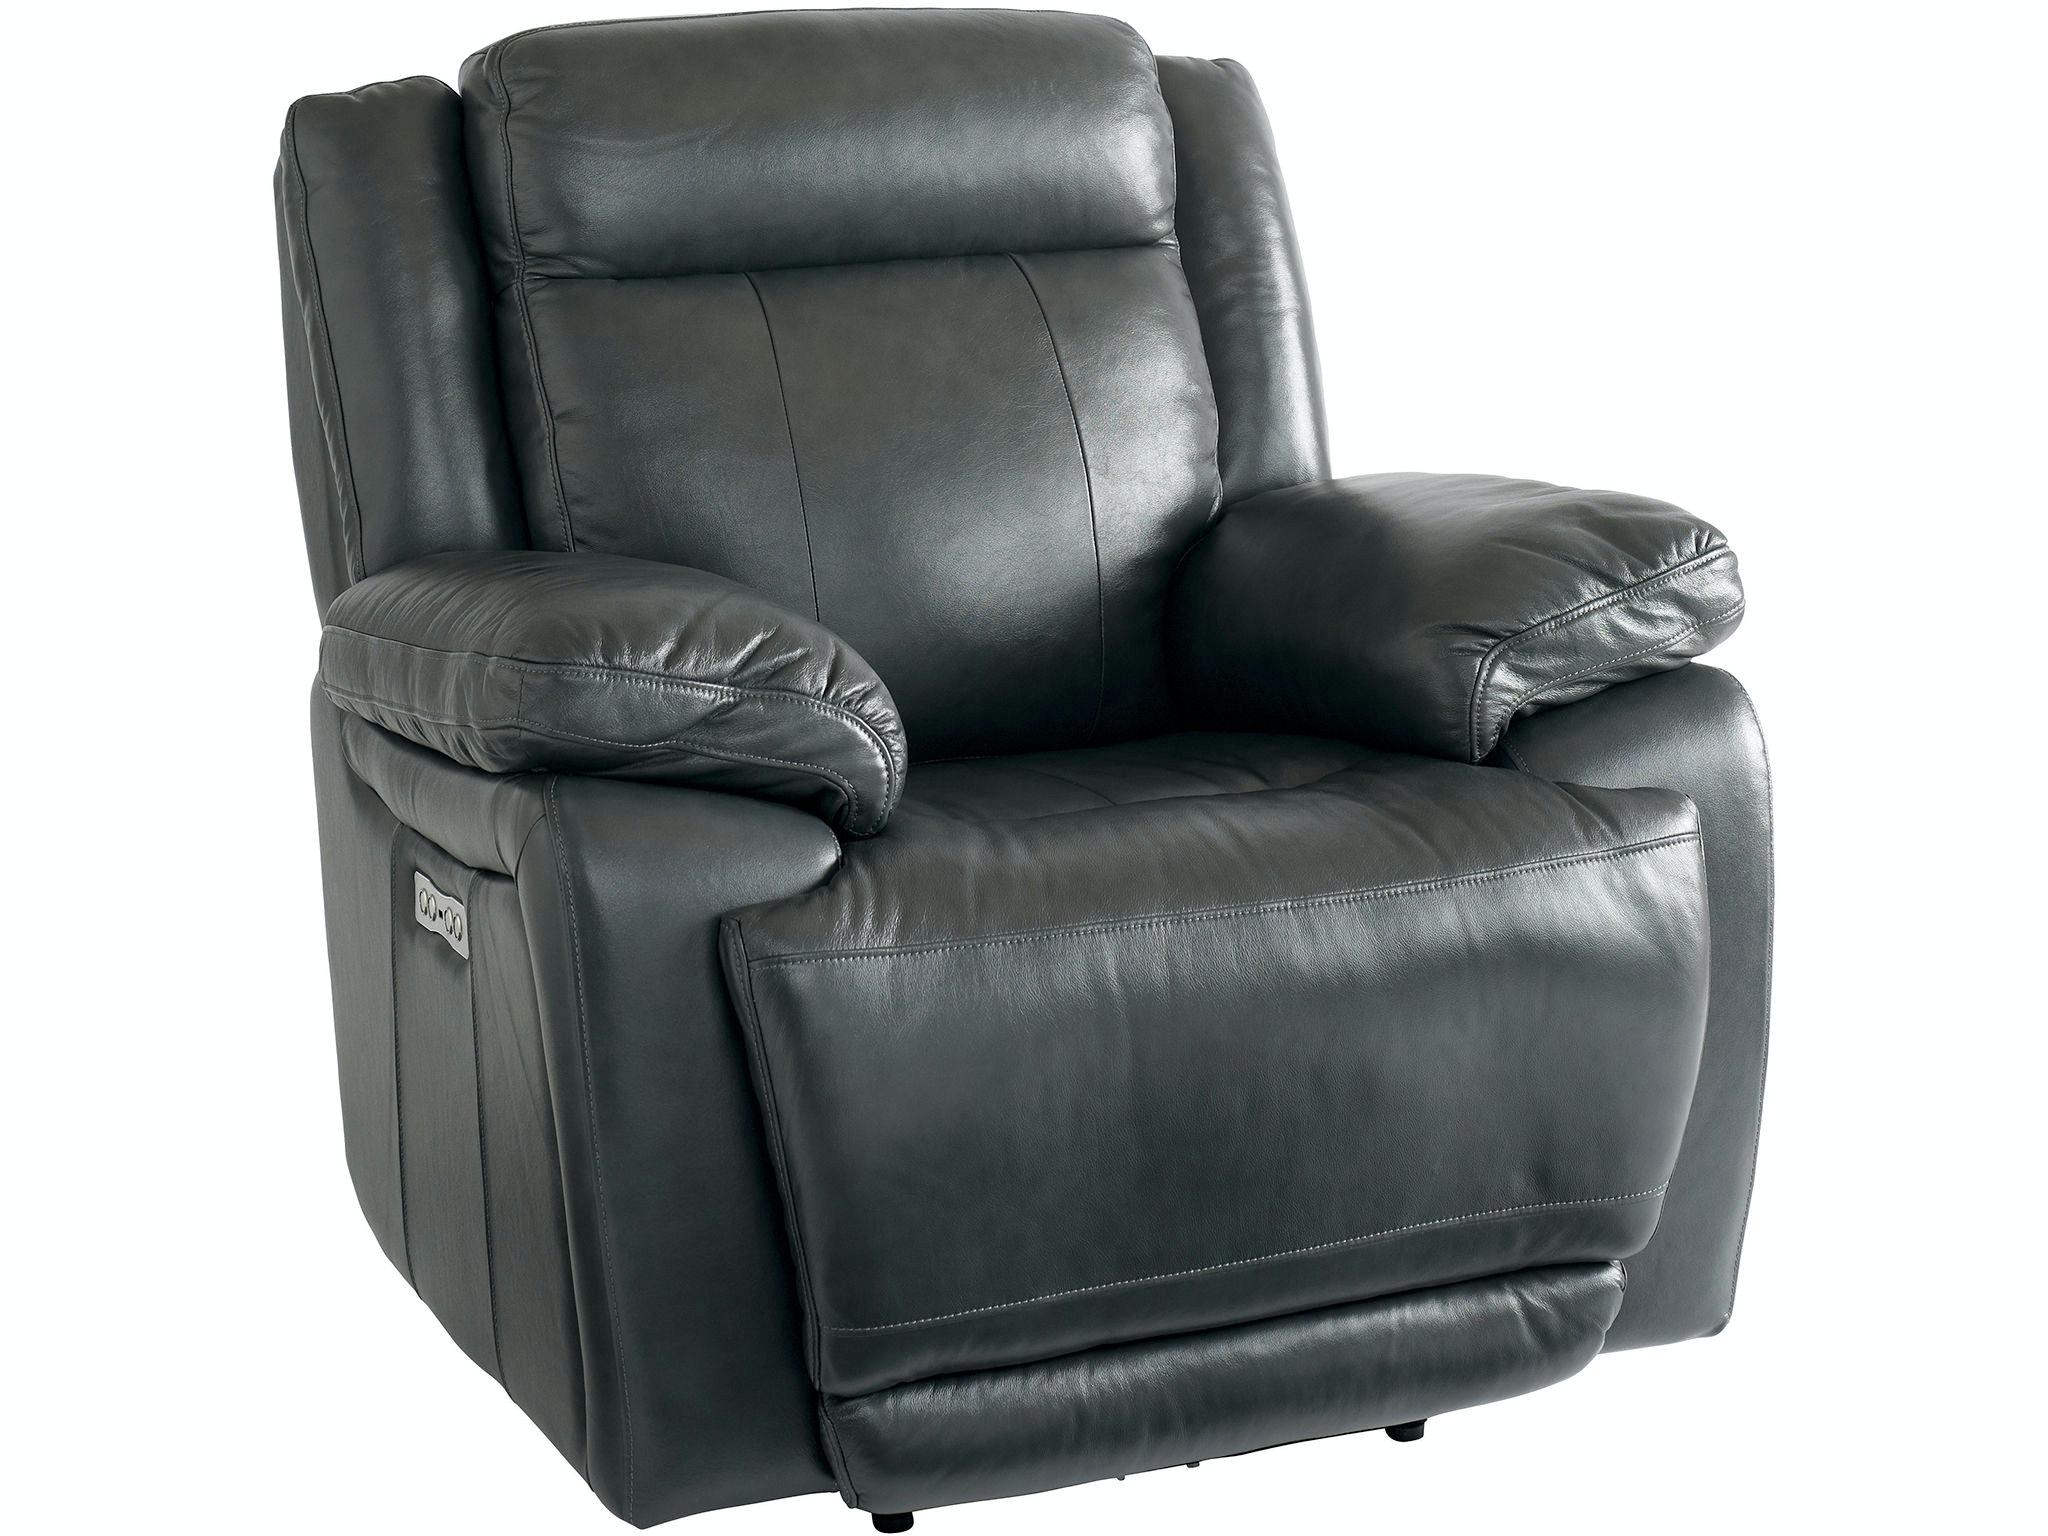 bassett living room wallsaver recliner w  power 3706 p0g